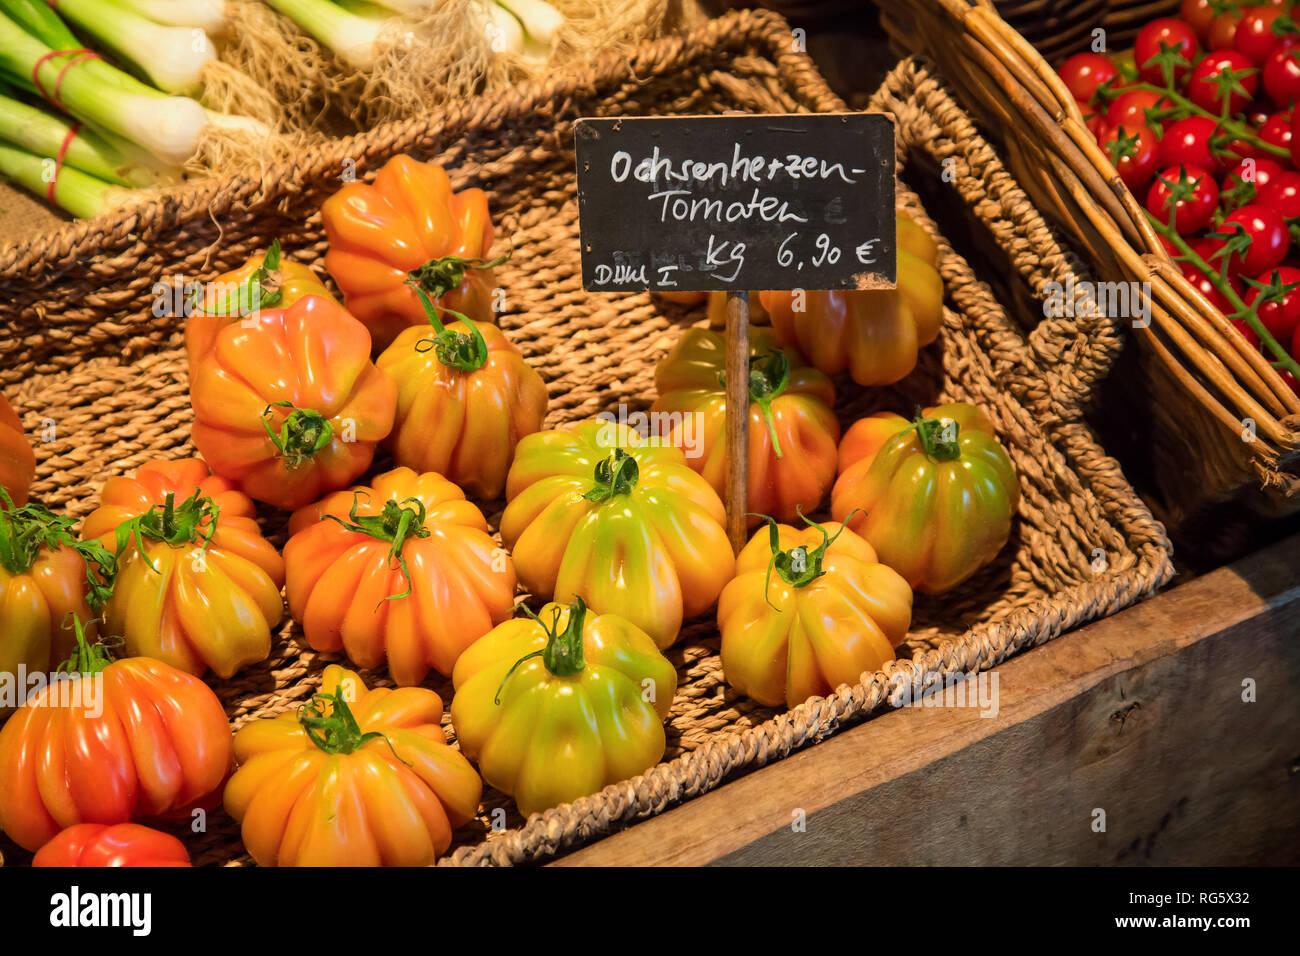 Ox heart tomatoes, farm shop, asparagus yard Schulte-Scherlebeck, Ochsenherzentomaten, Hofladen, Spargelhof Schulte-Scherlebeck Stock Photo